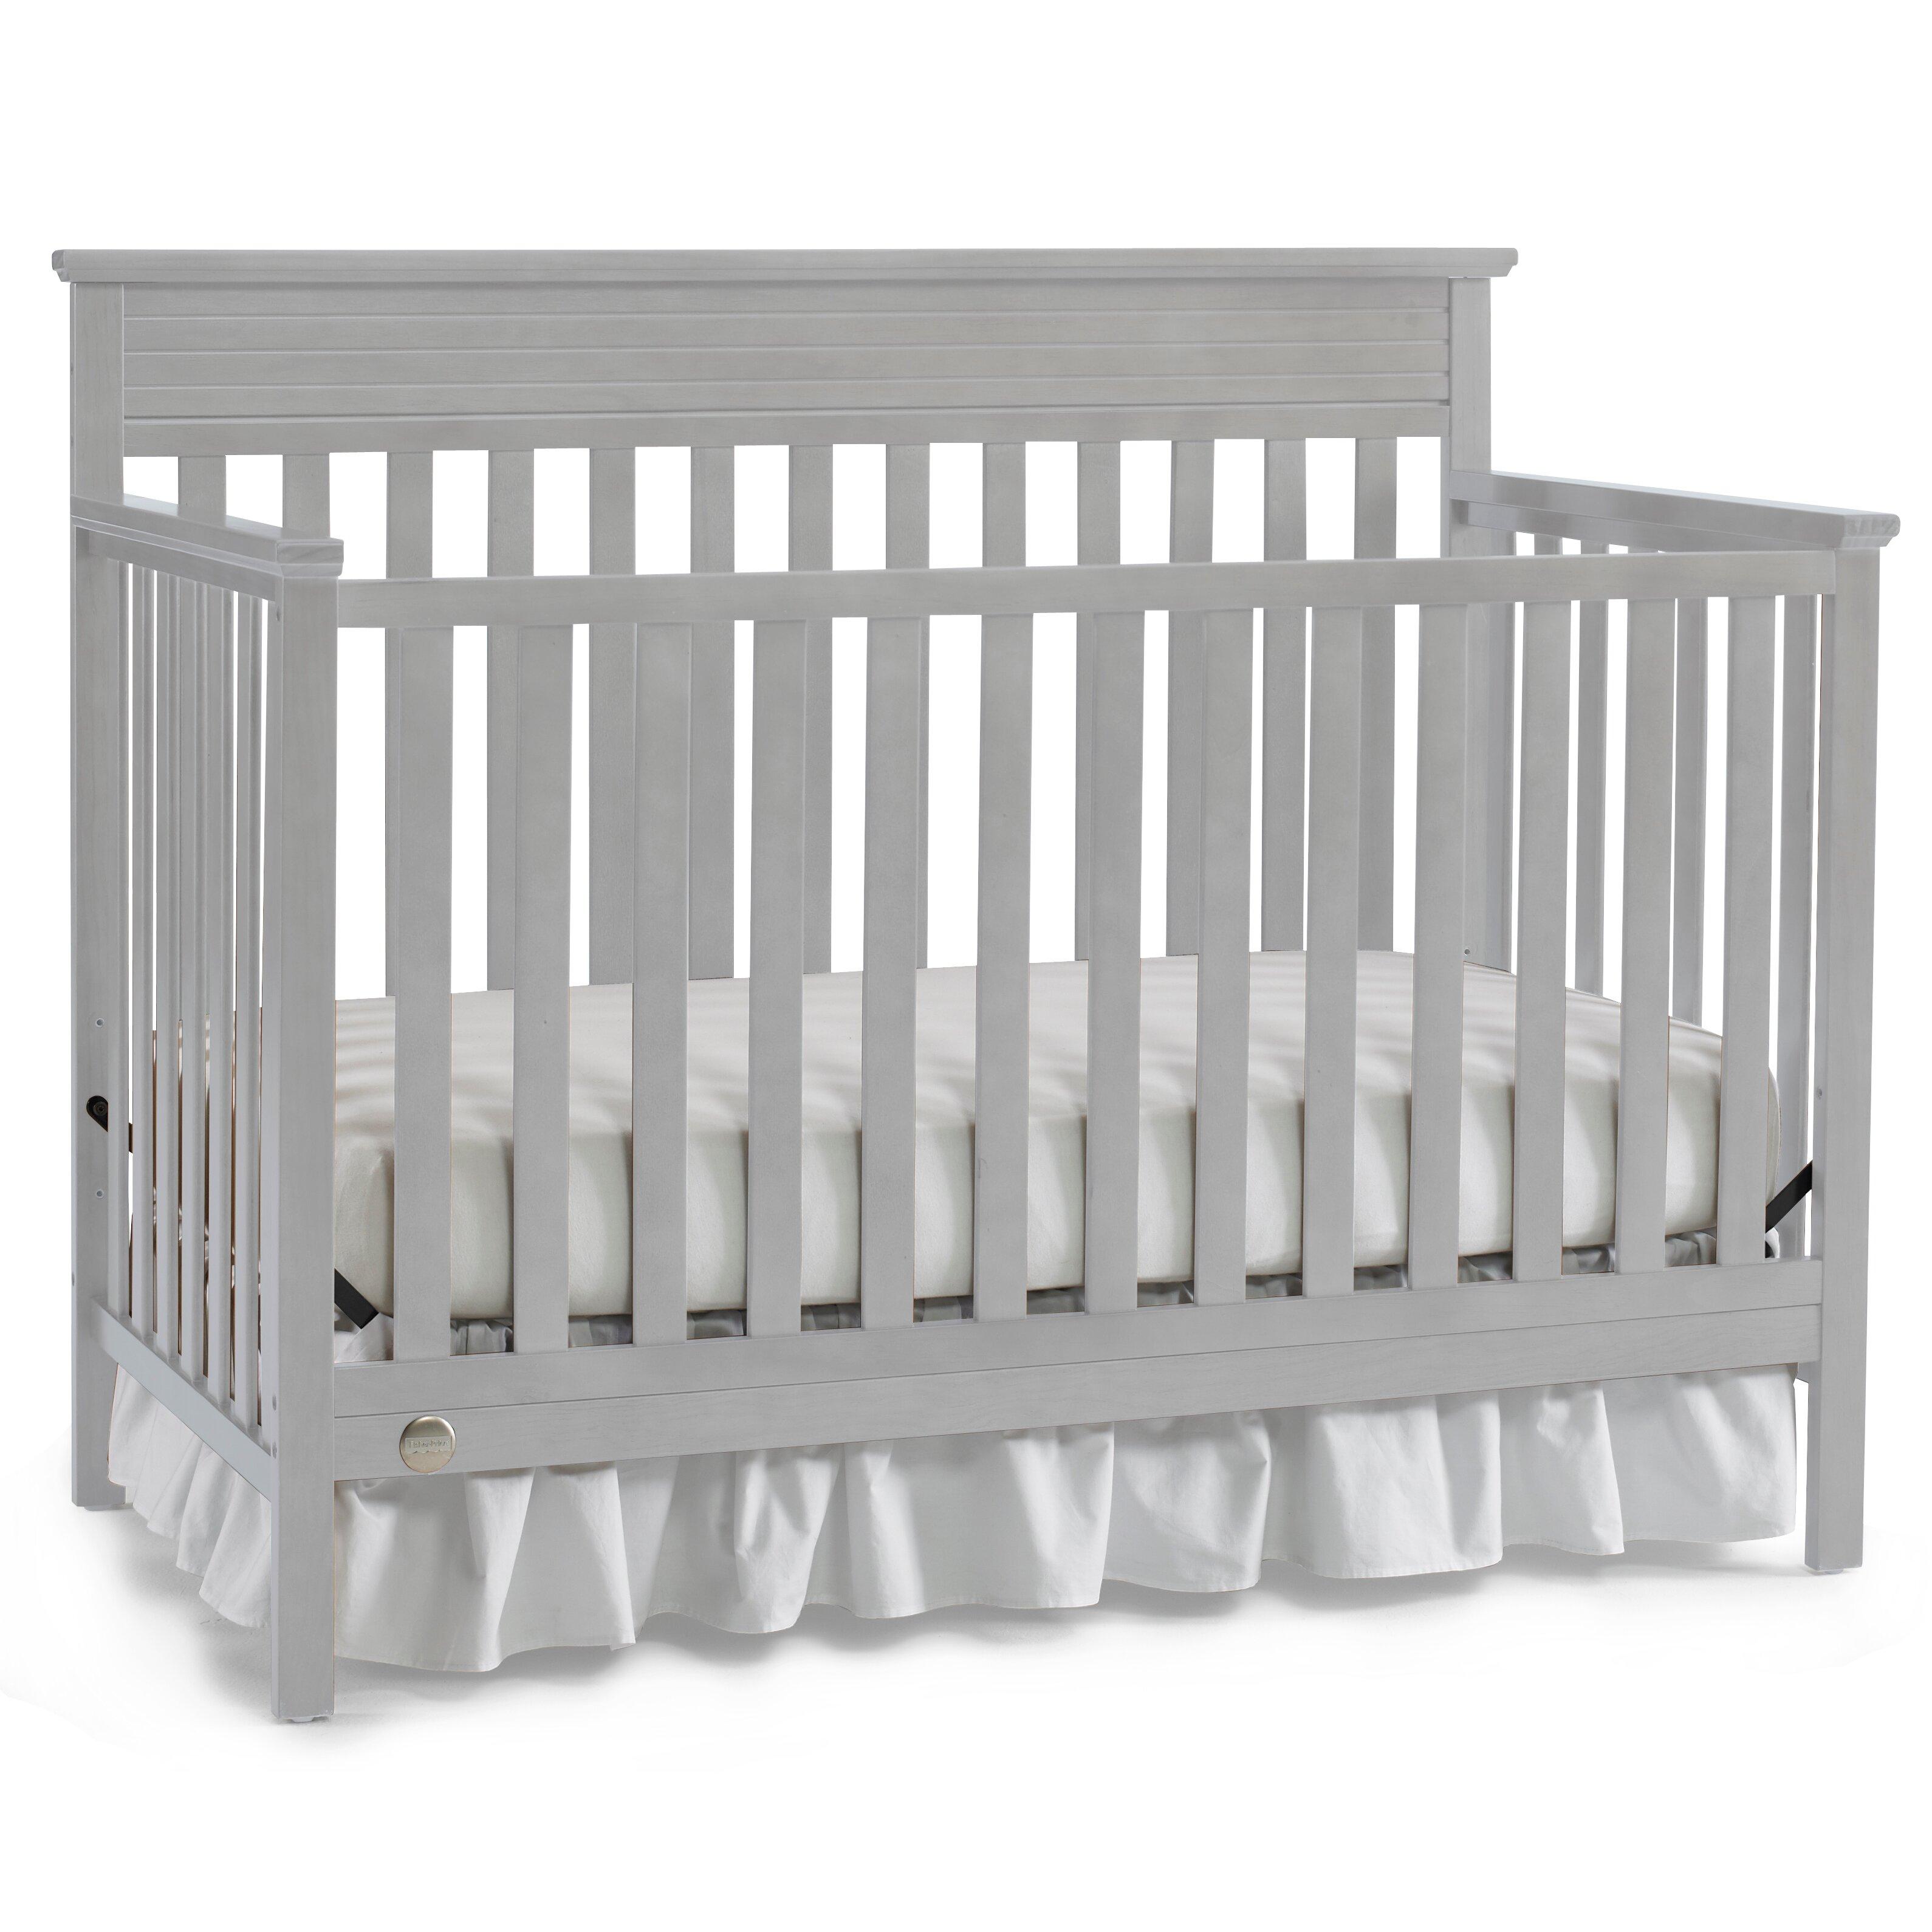 Crib for sale sheffield - Fisher Price Newbury 4 In 1 Convertible Crib